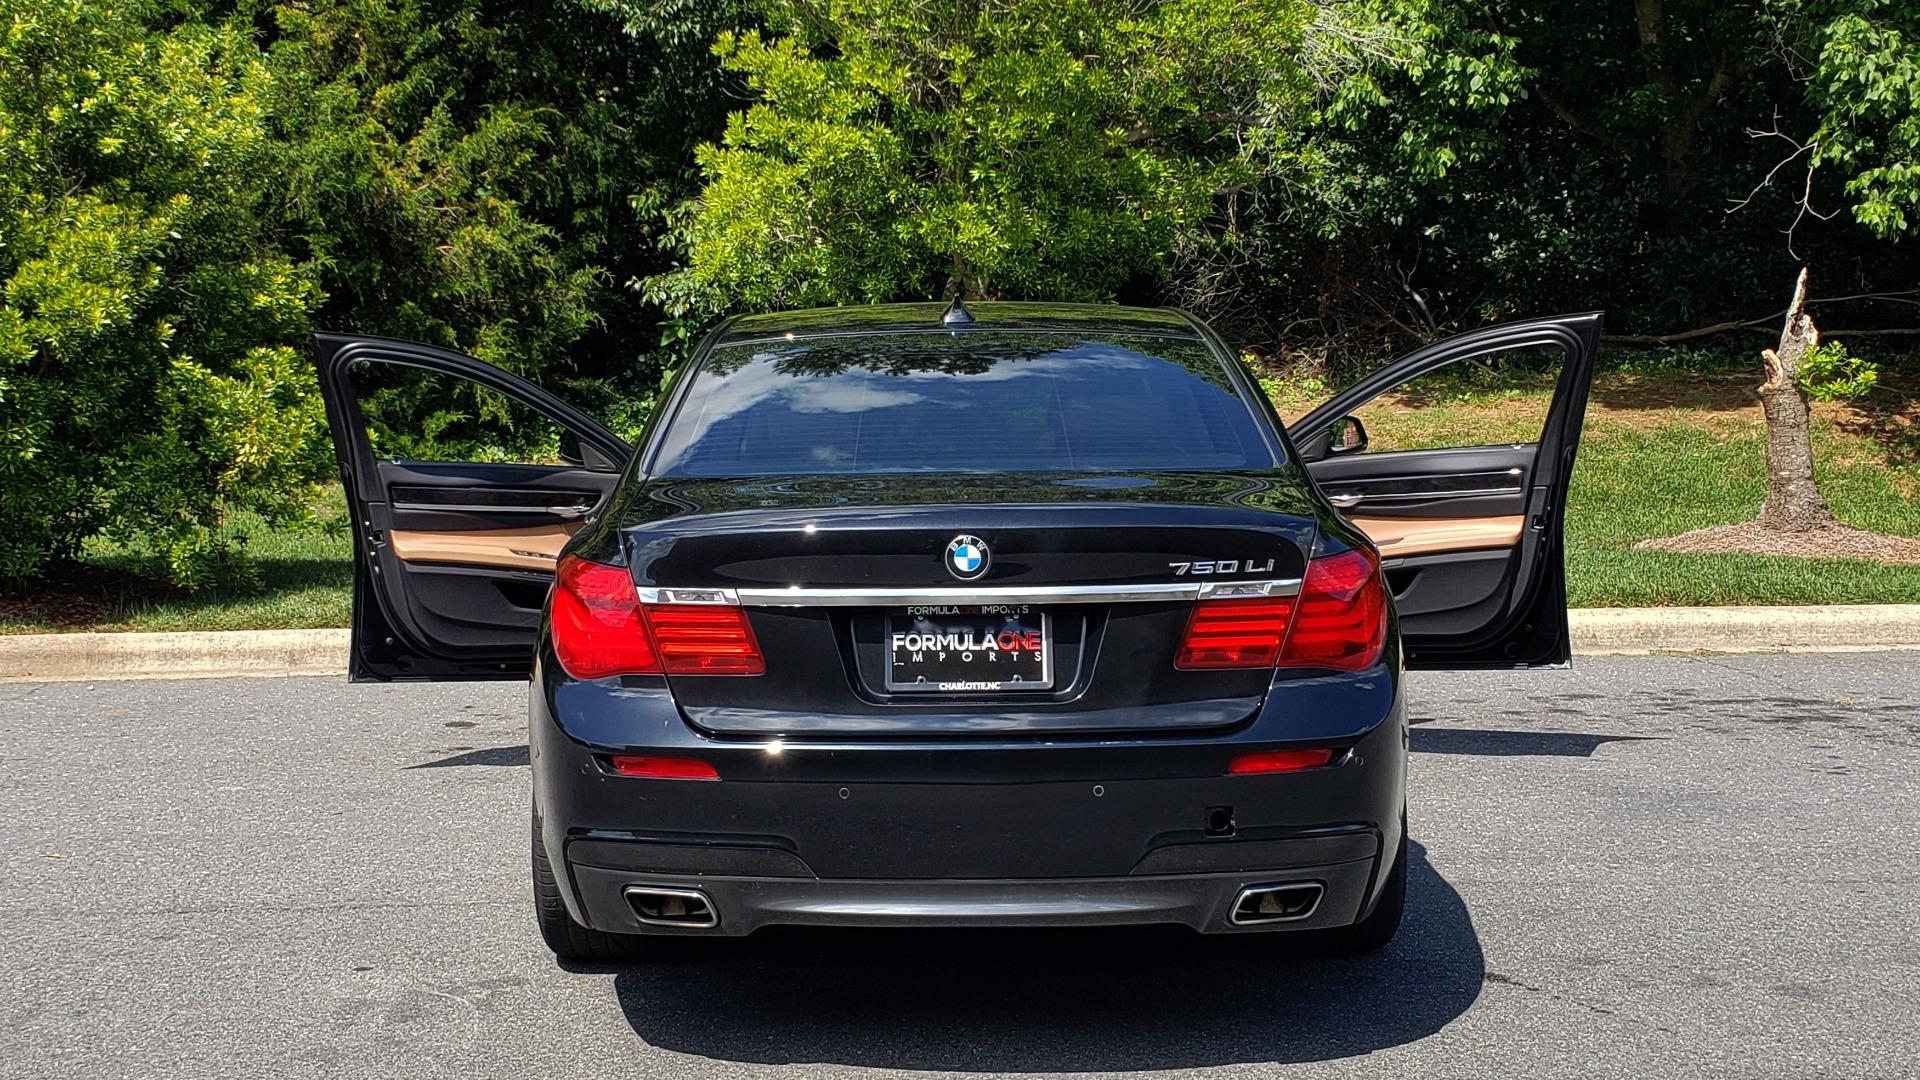 Used 2014 BMW 7 SERIES 750LI M-SPORT / EXEC PKG / DRVR ASST / LIGHTING / NAV / SUNROOF for sale Sold at Formula Imports in Charlotte NC 28227 25